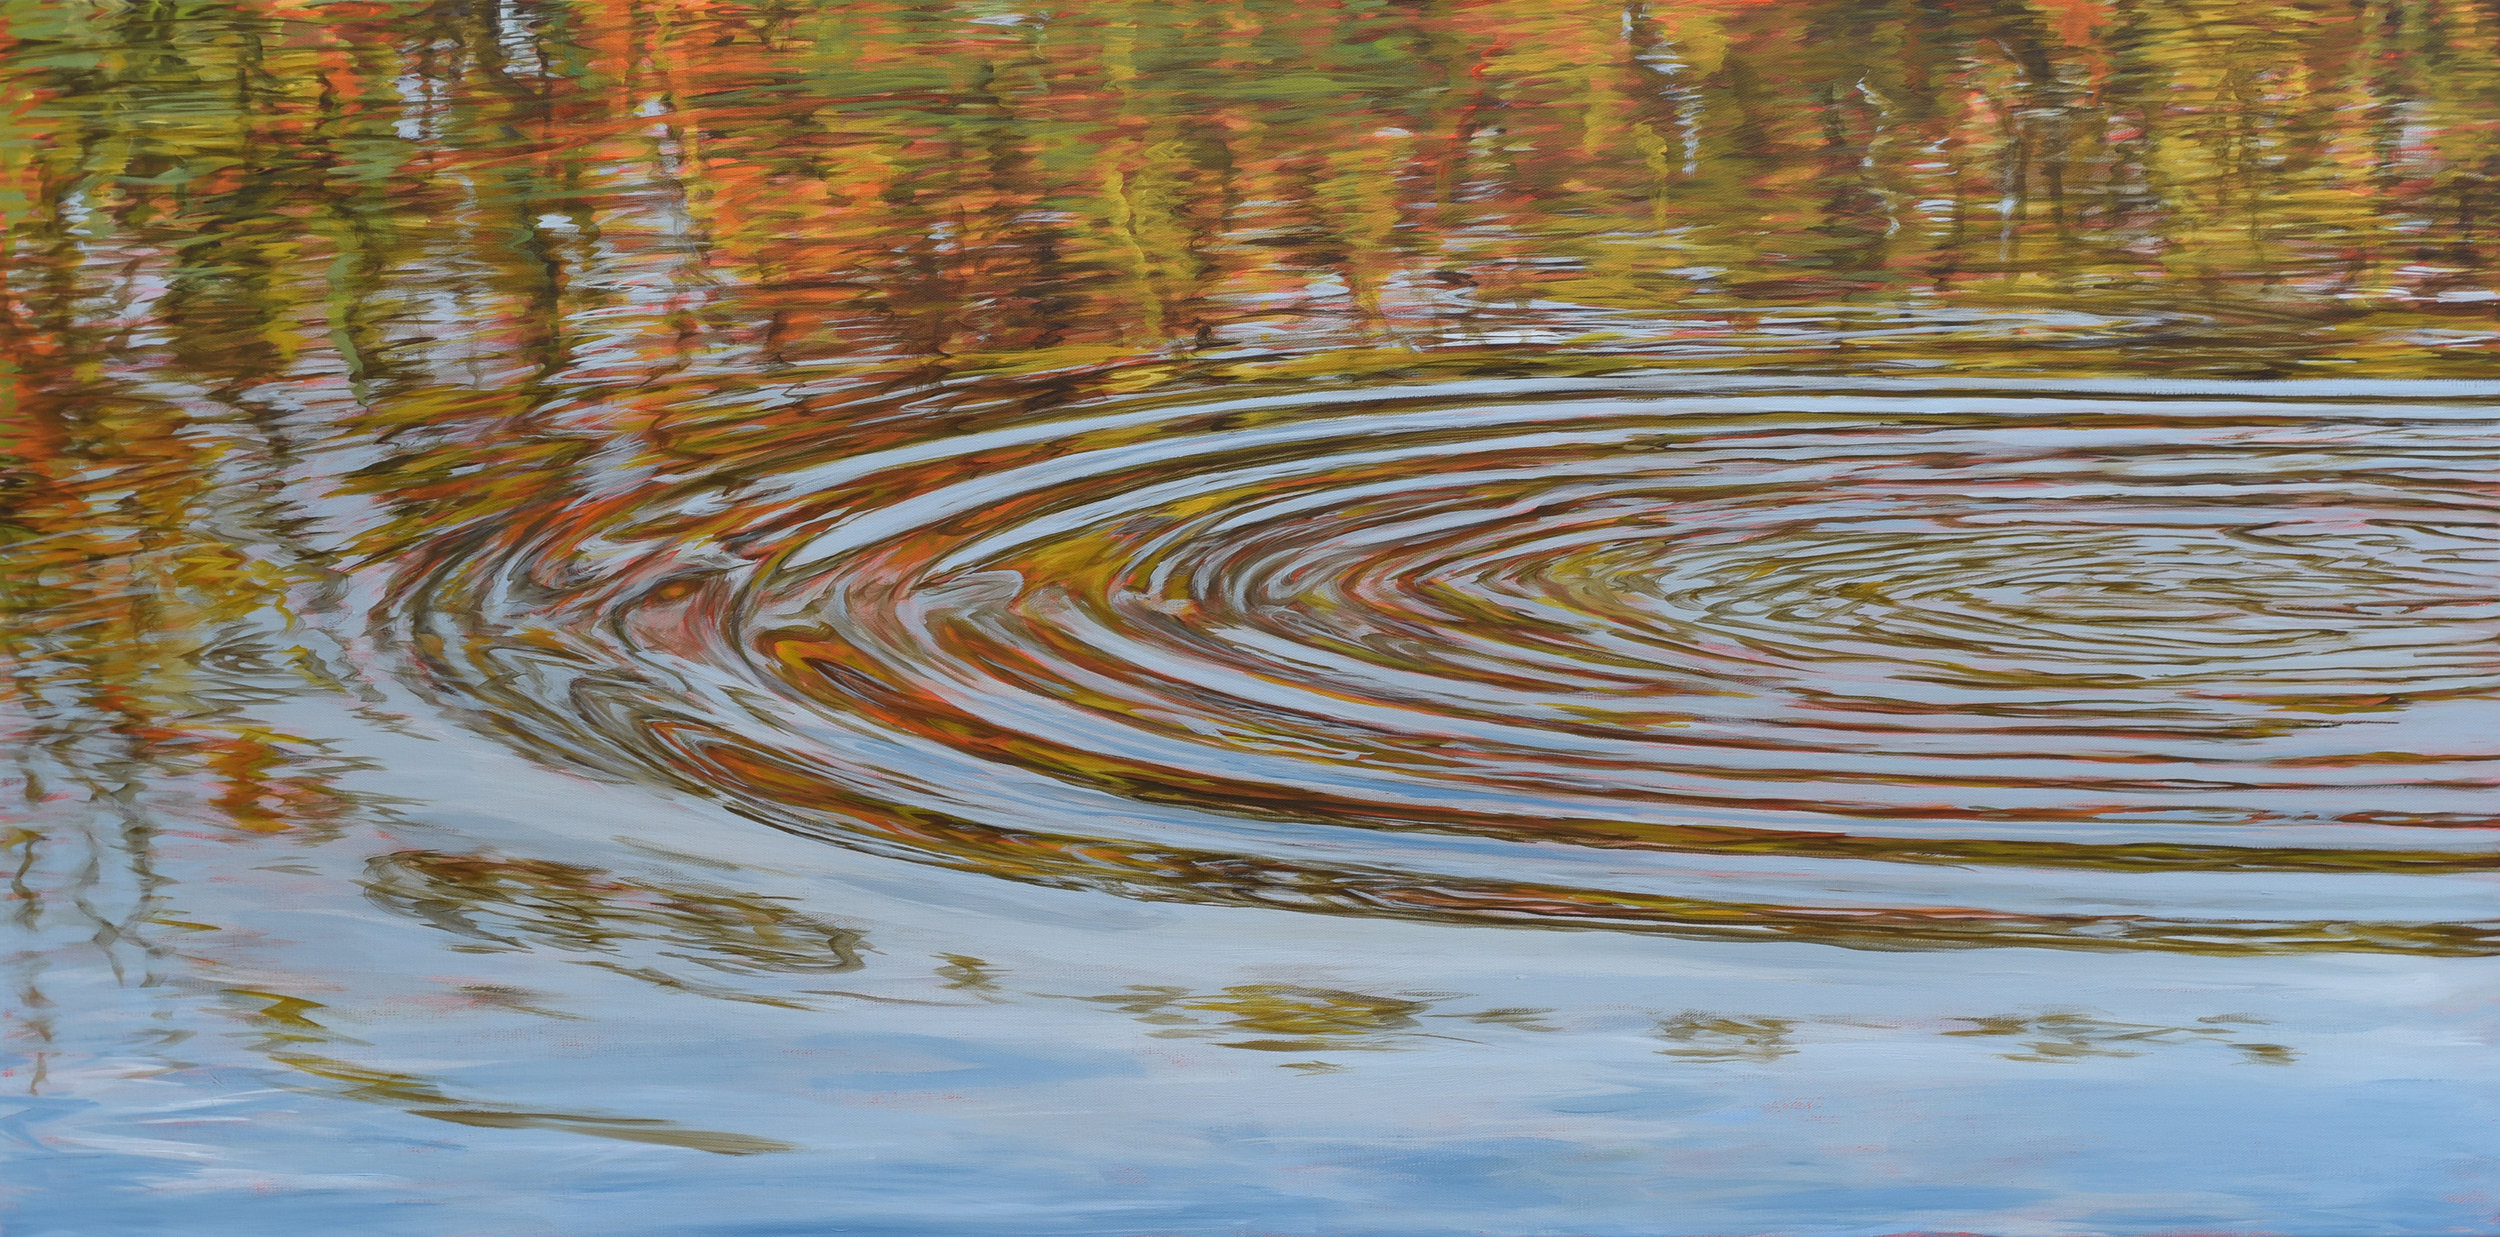 20496930-ElizabethGeisler_AutumnReprise_Painting_24x48_3000.jpg